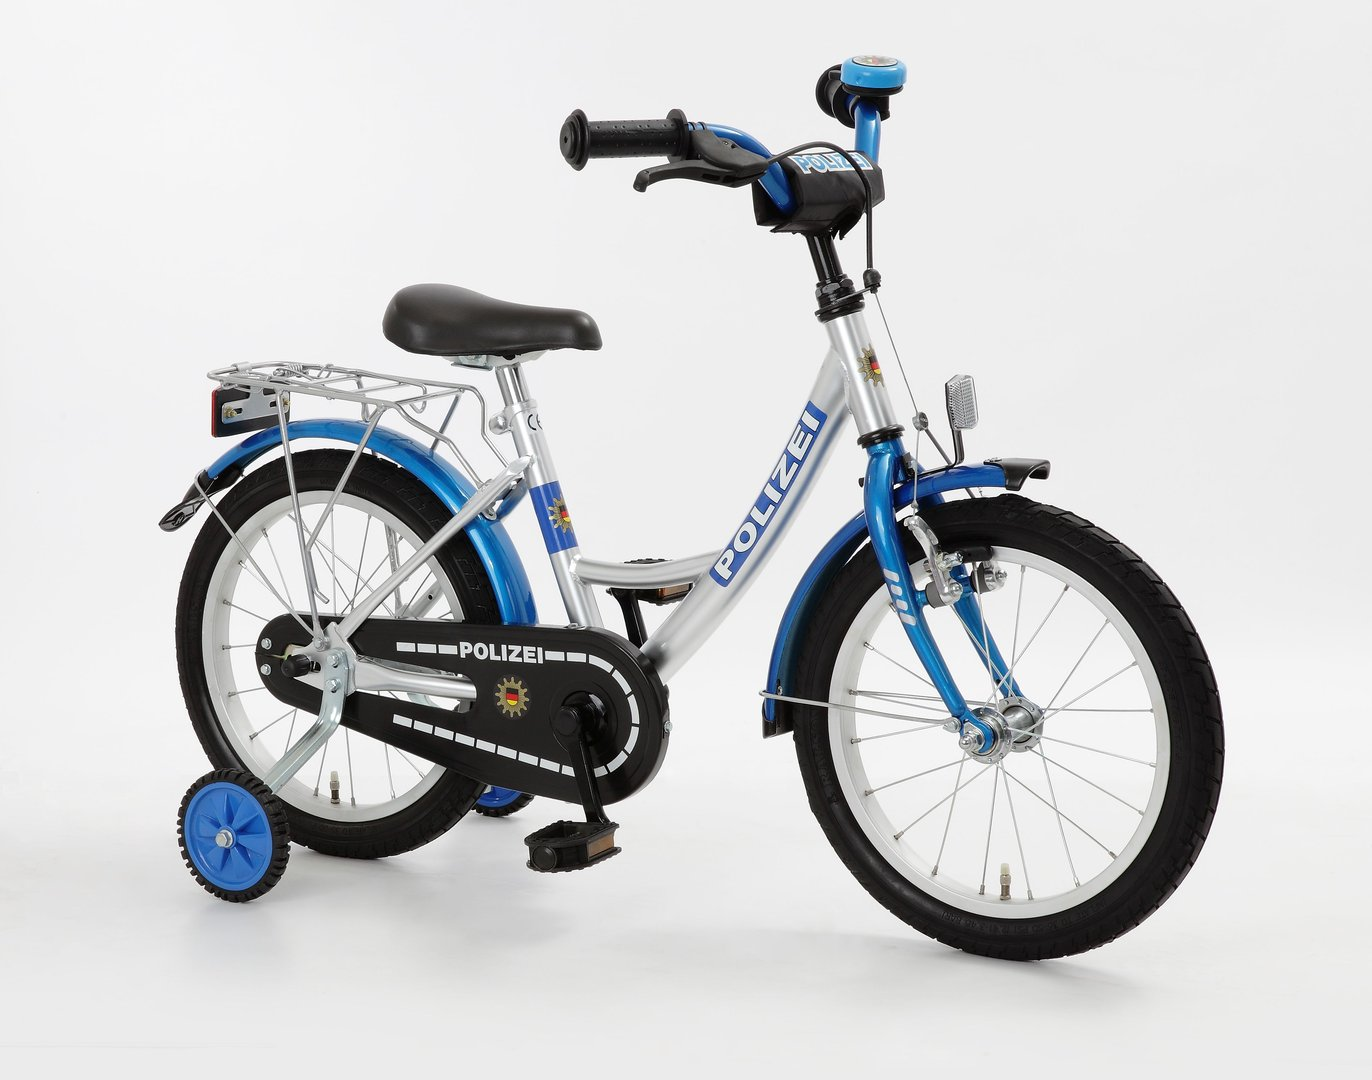 18 zoll kinderfahrrad polizei fahrrad fahrrad ass. Black Bedroom Furniture Sets. Home Design Ideas